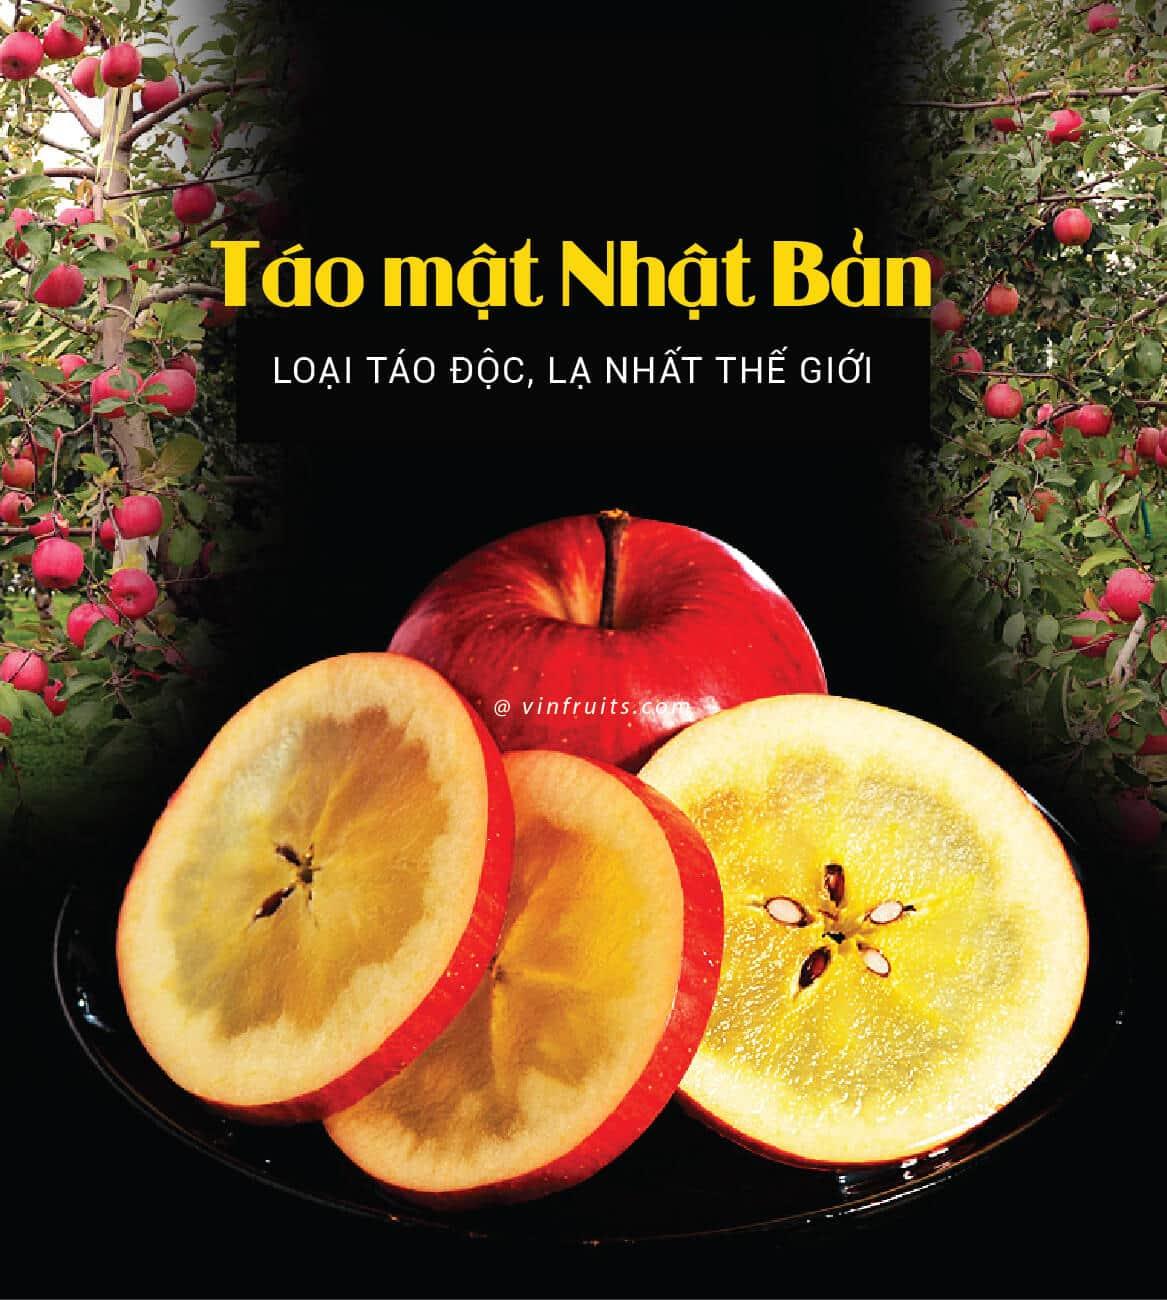 Tao mat Nhat Ban - vinfruits